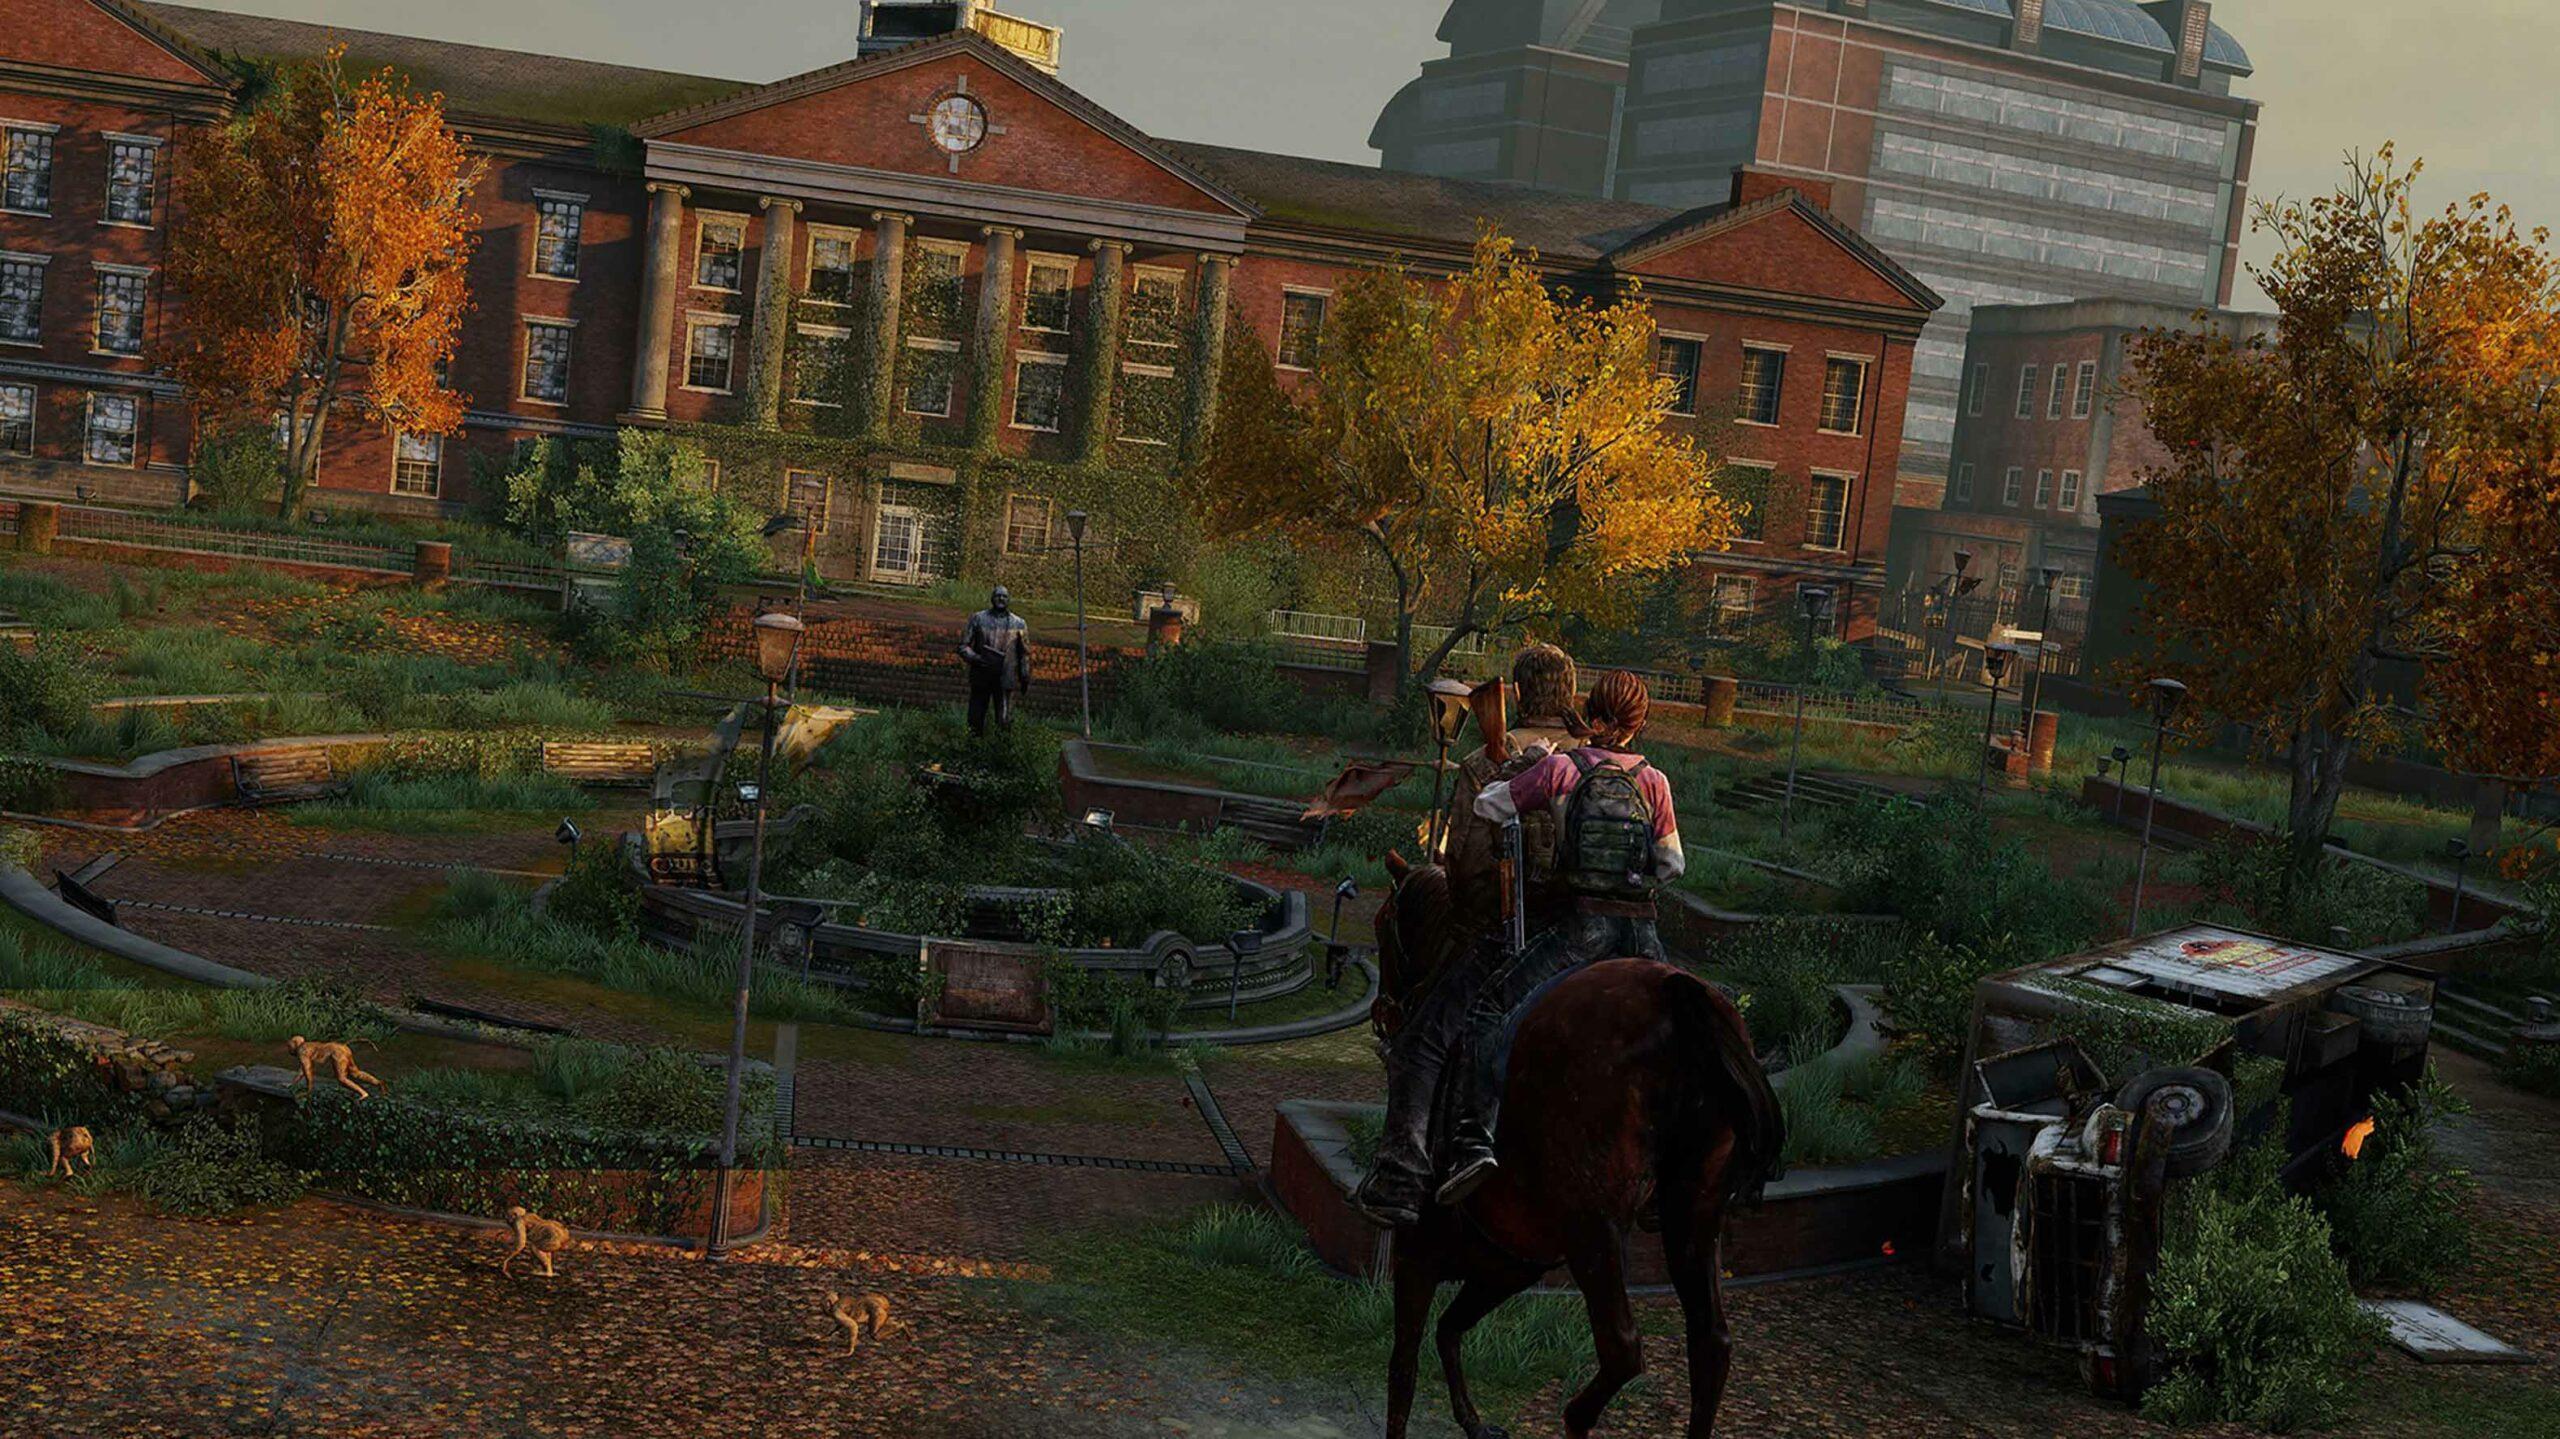 The Last of Us Joel and Ellie horseback